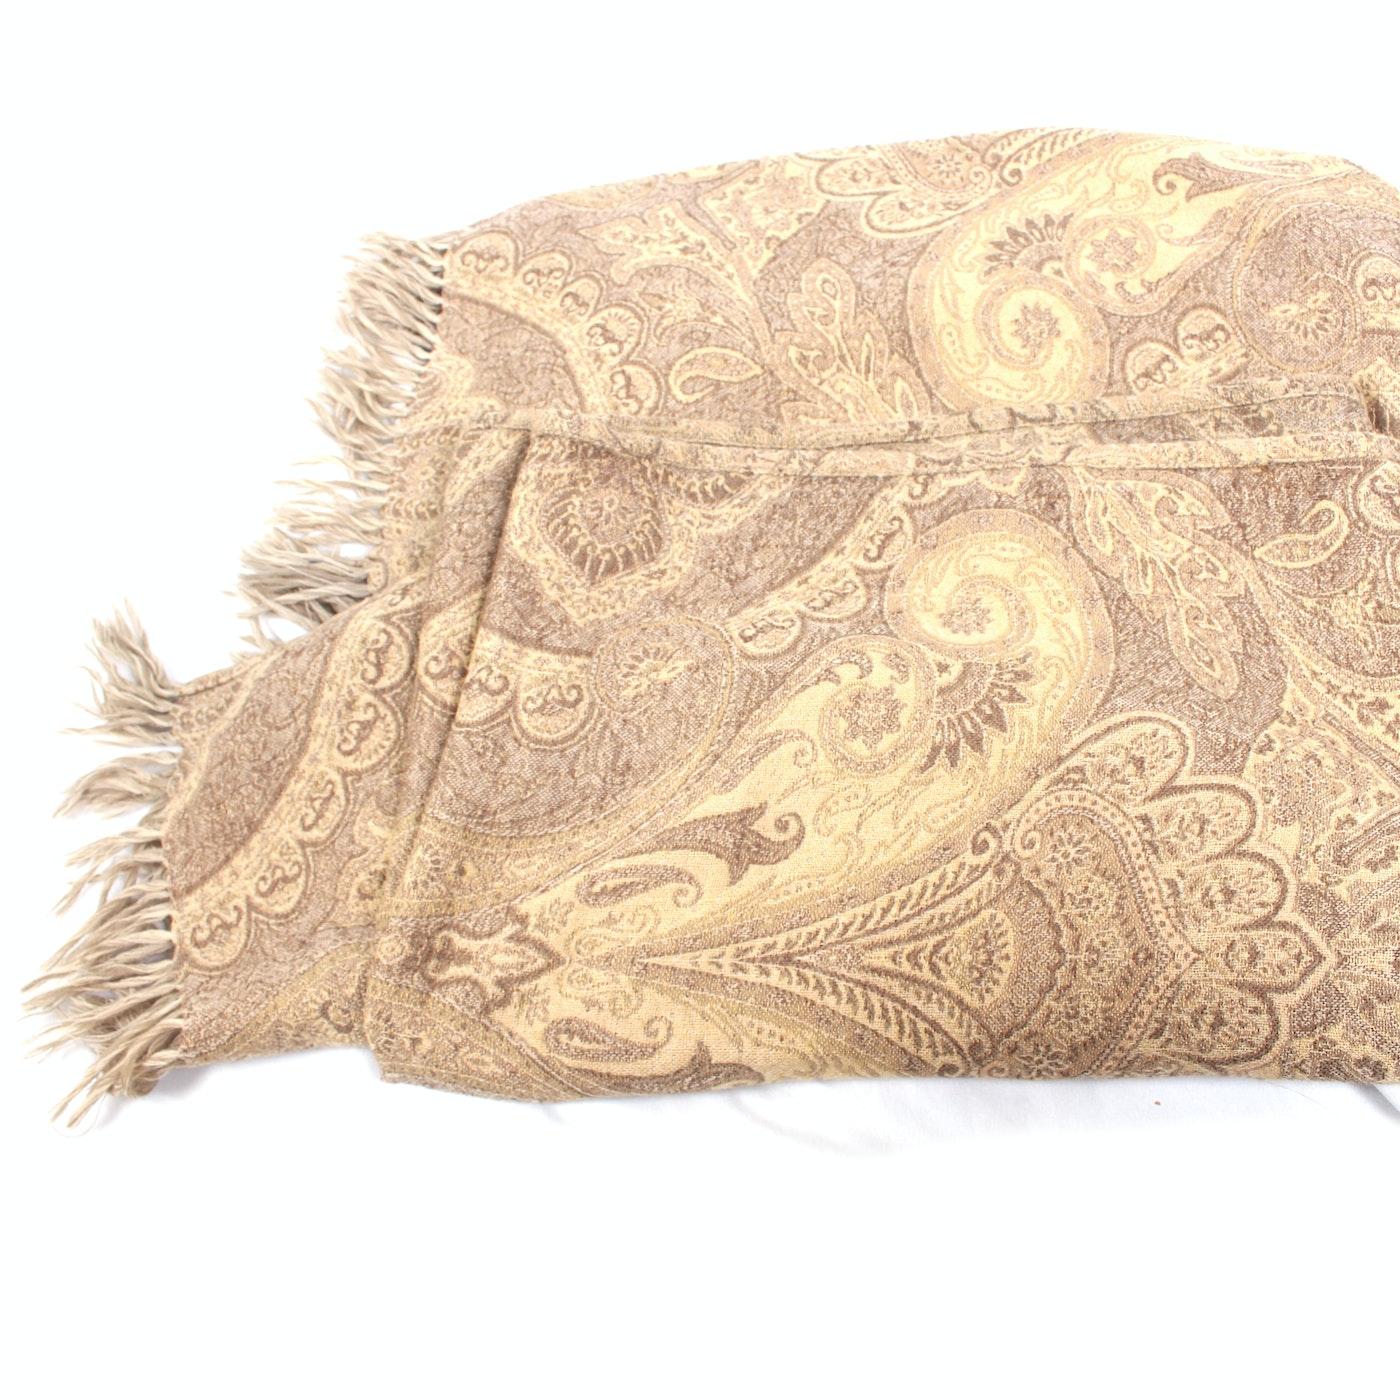 Restoration Hardware Sofa Throws: Restoration Hardware Throw And Accent Pillows : EBTH